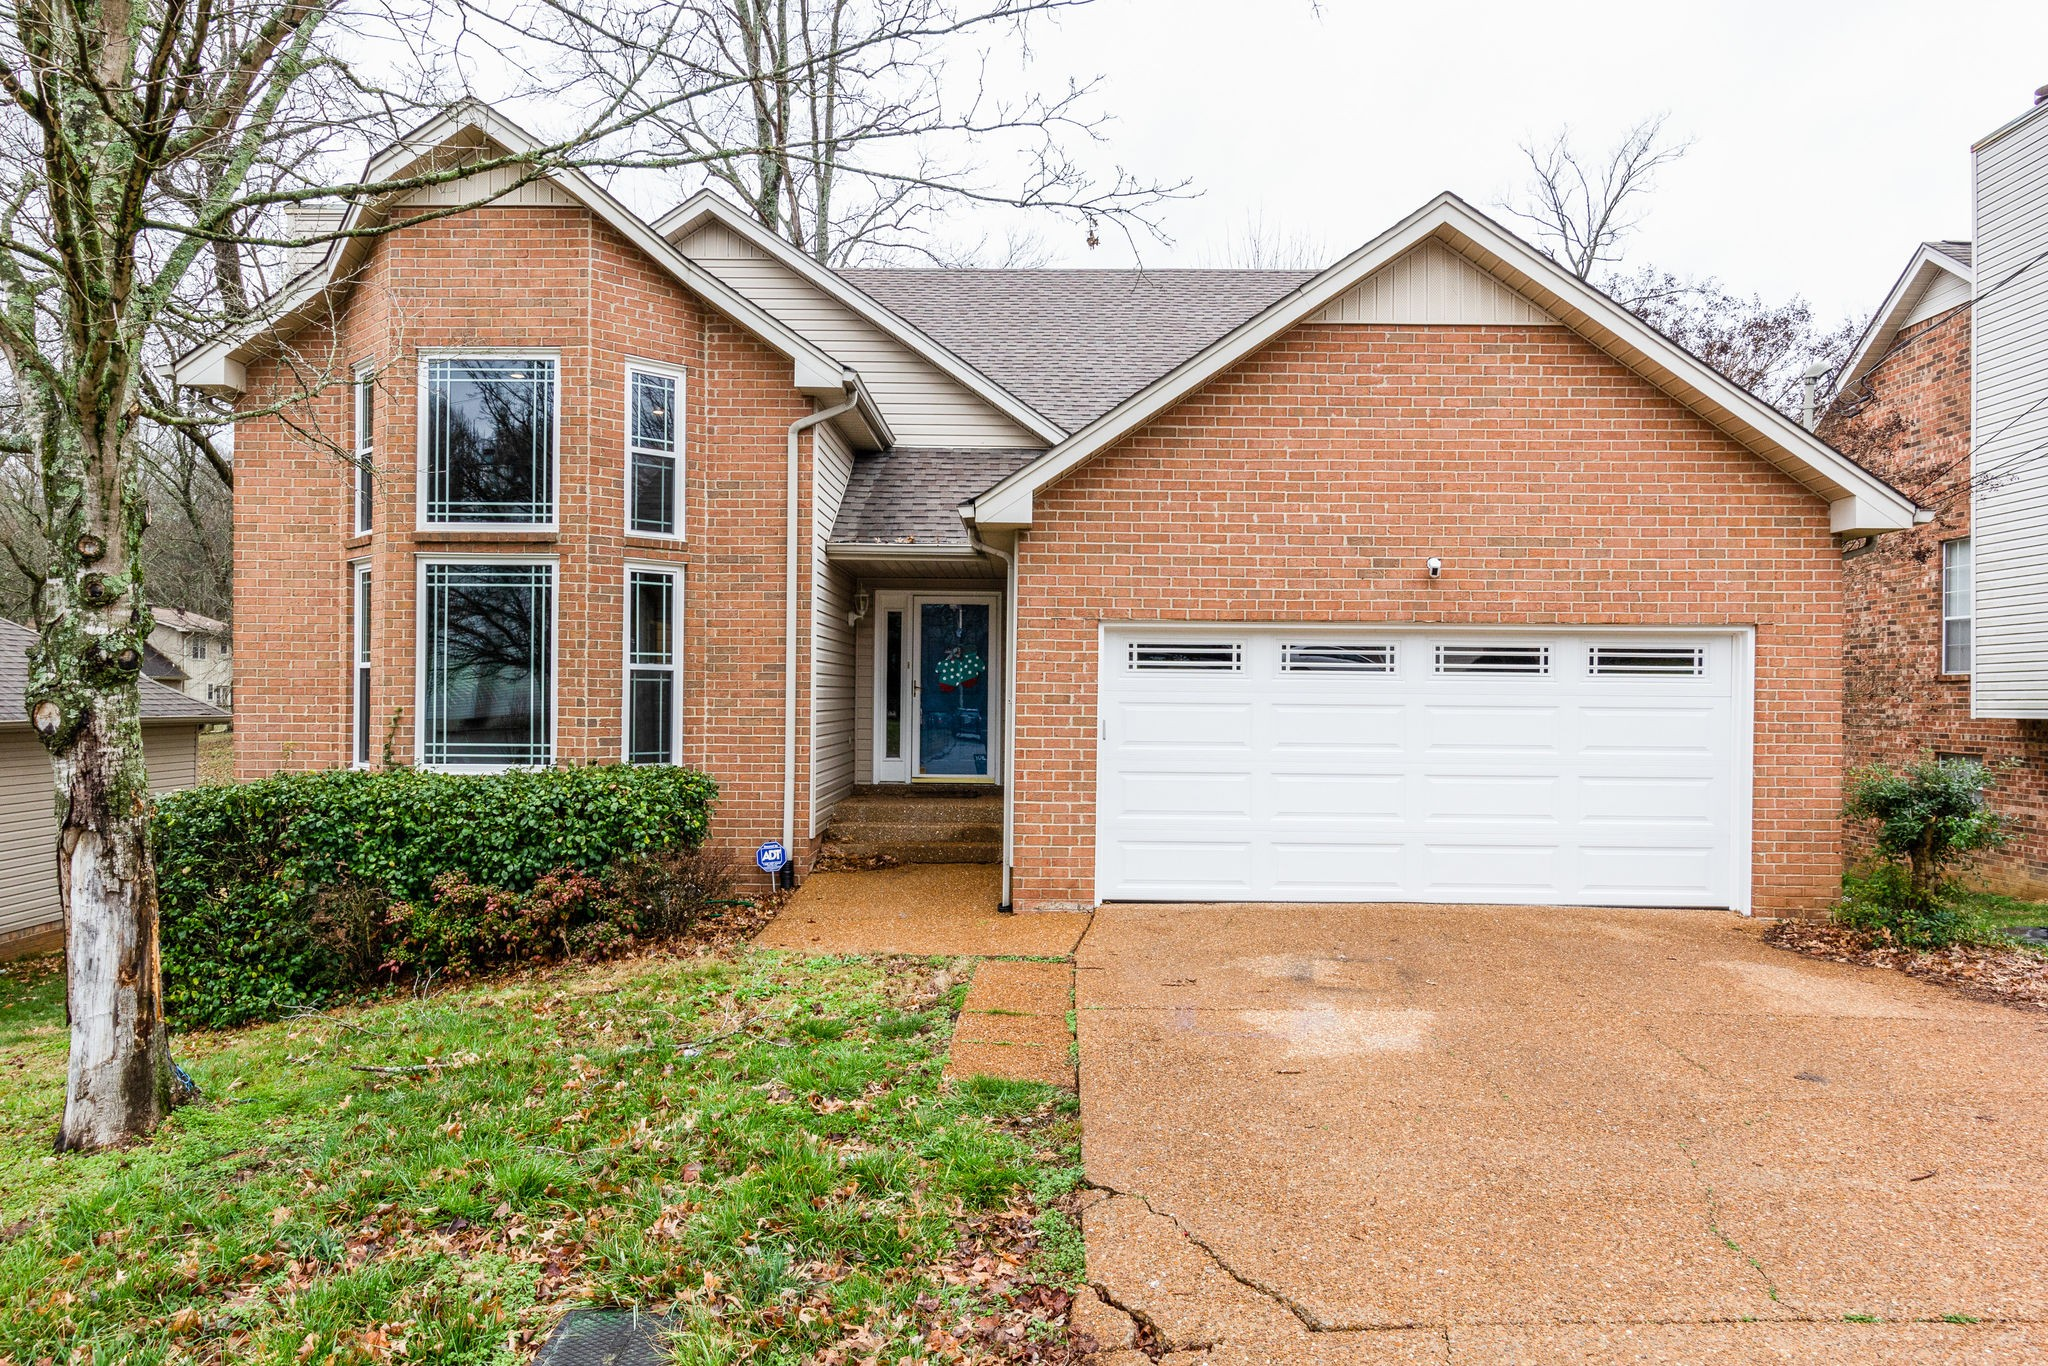 3412 Cobble St, Nashville, TN 37211 - Nashville, TN real estate listing